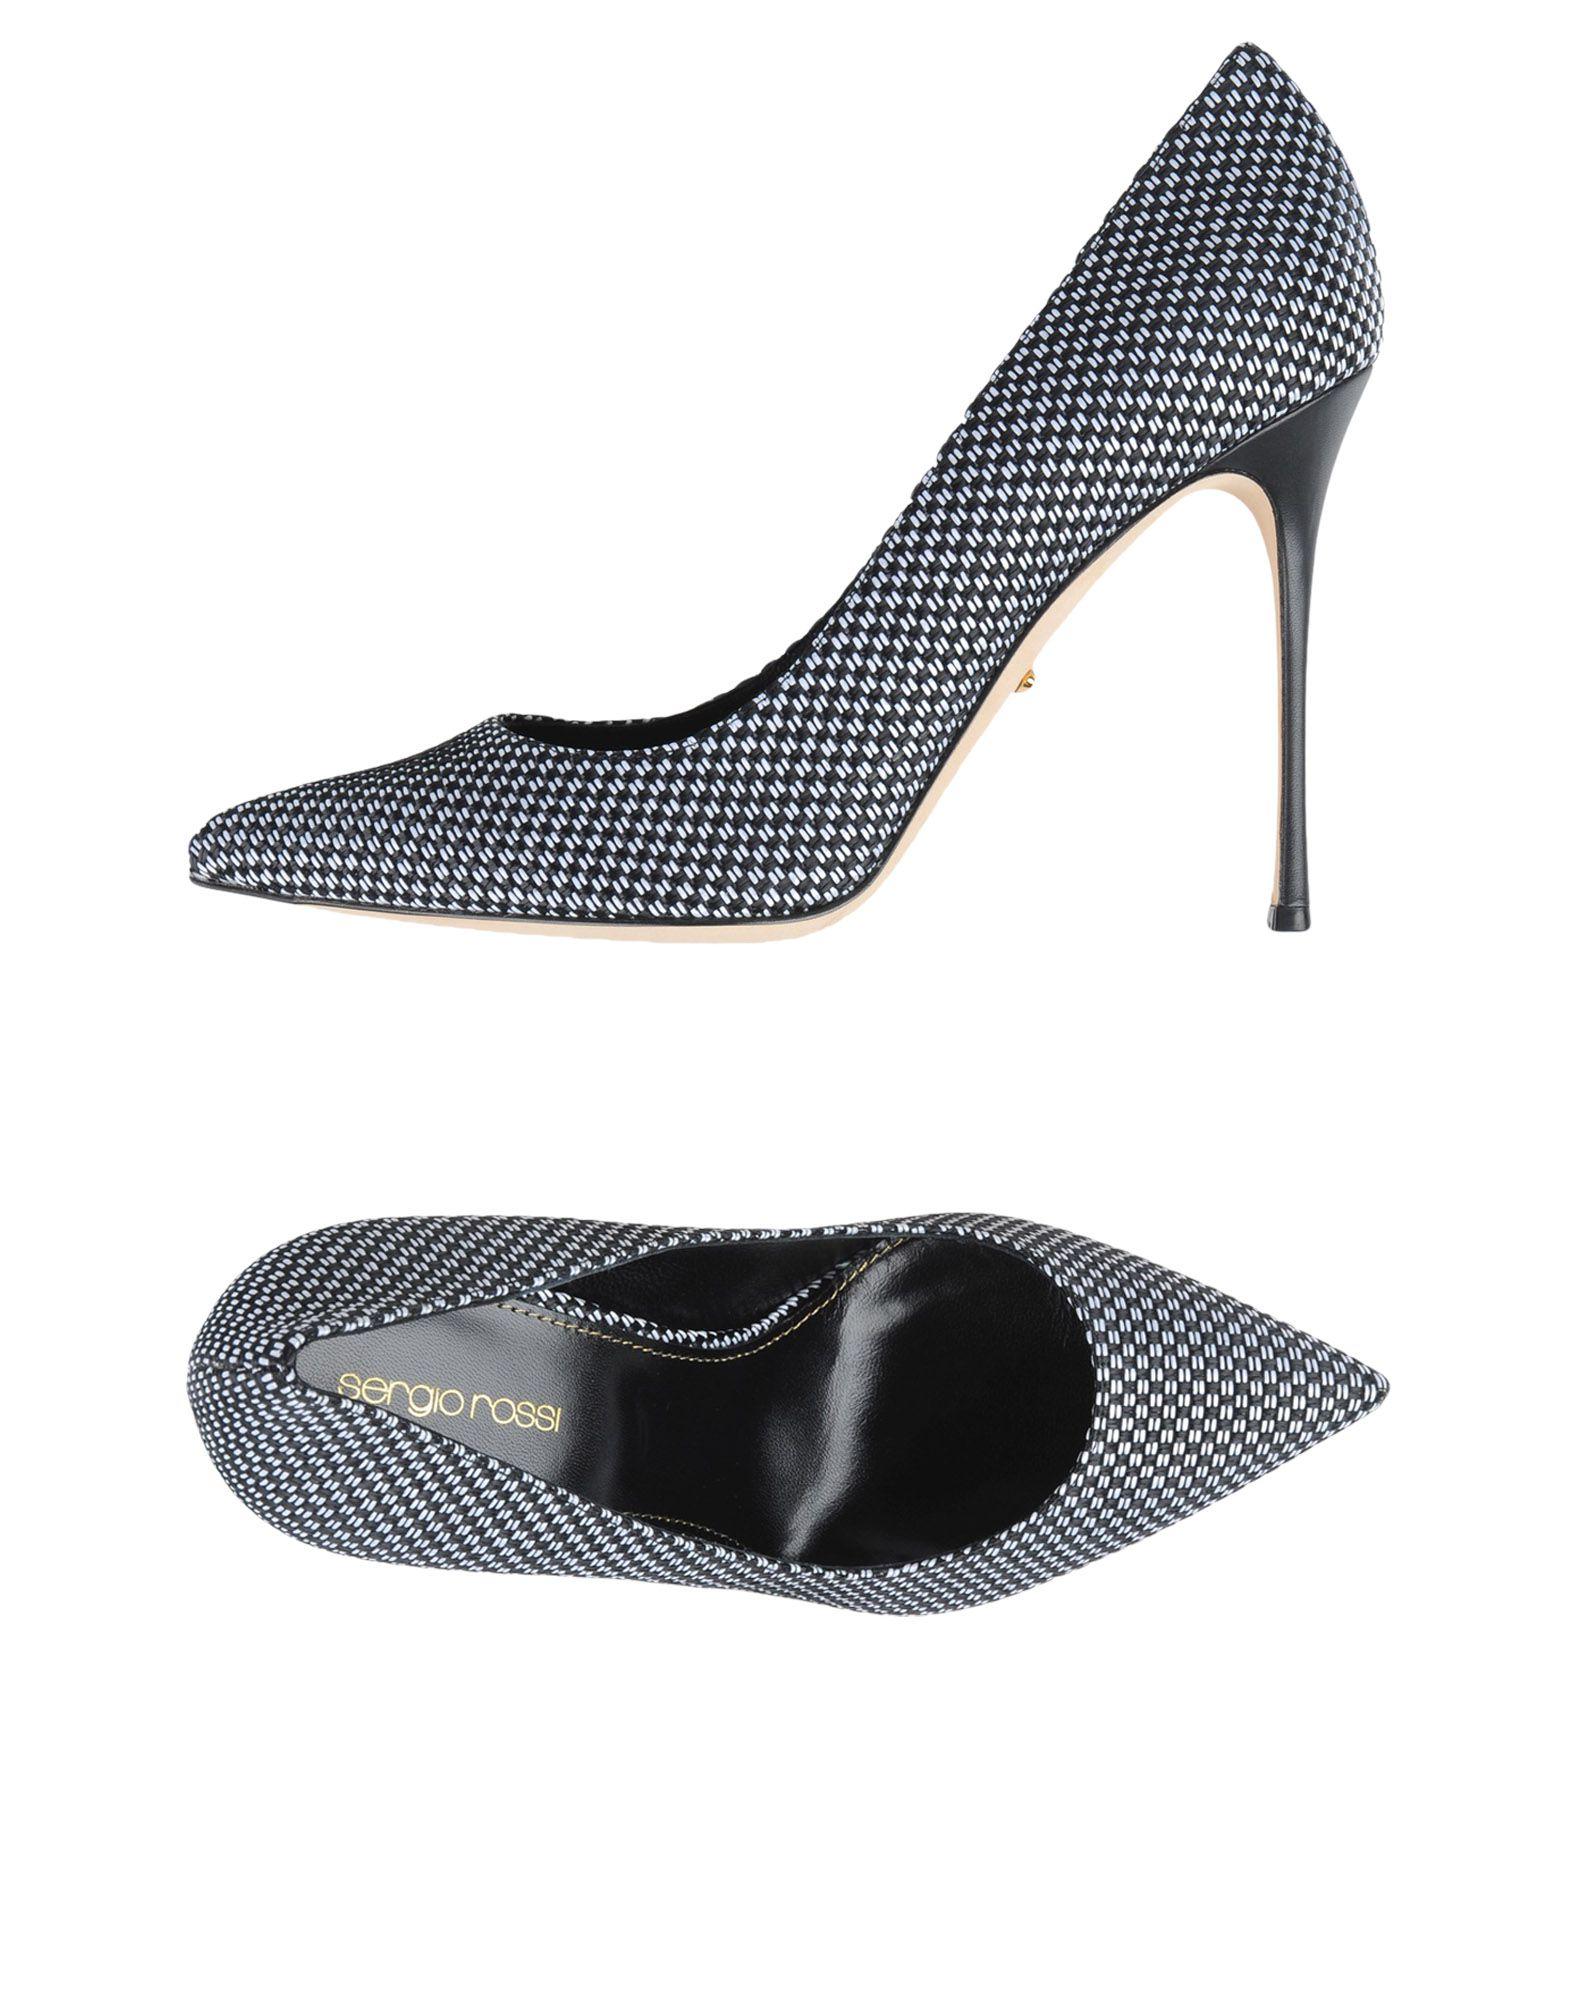 Rabatt Schuhe Sergio Rossi Pumps Damen  11286570RB